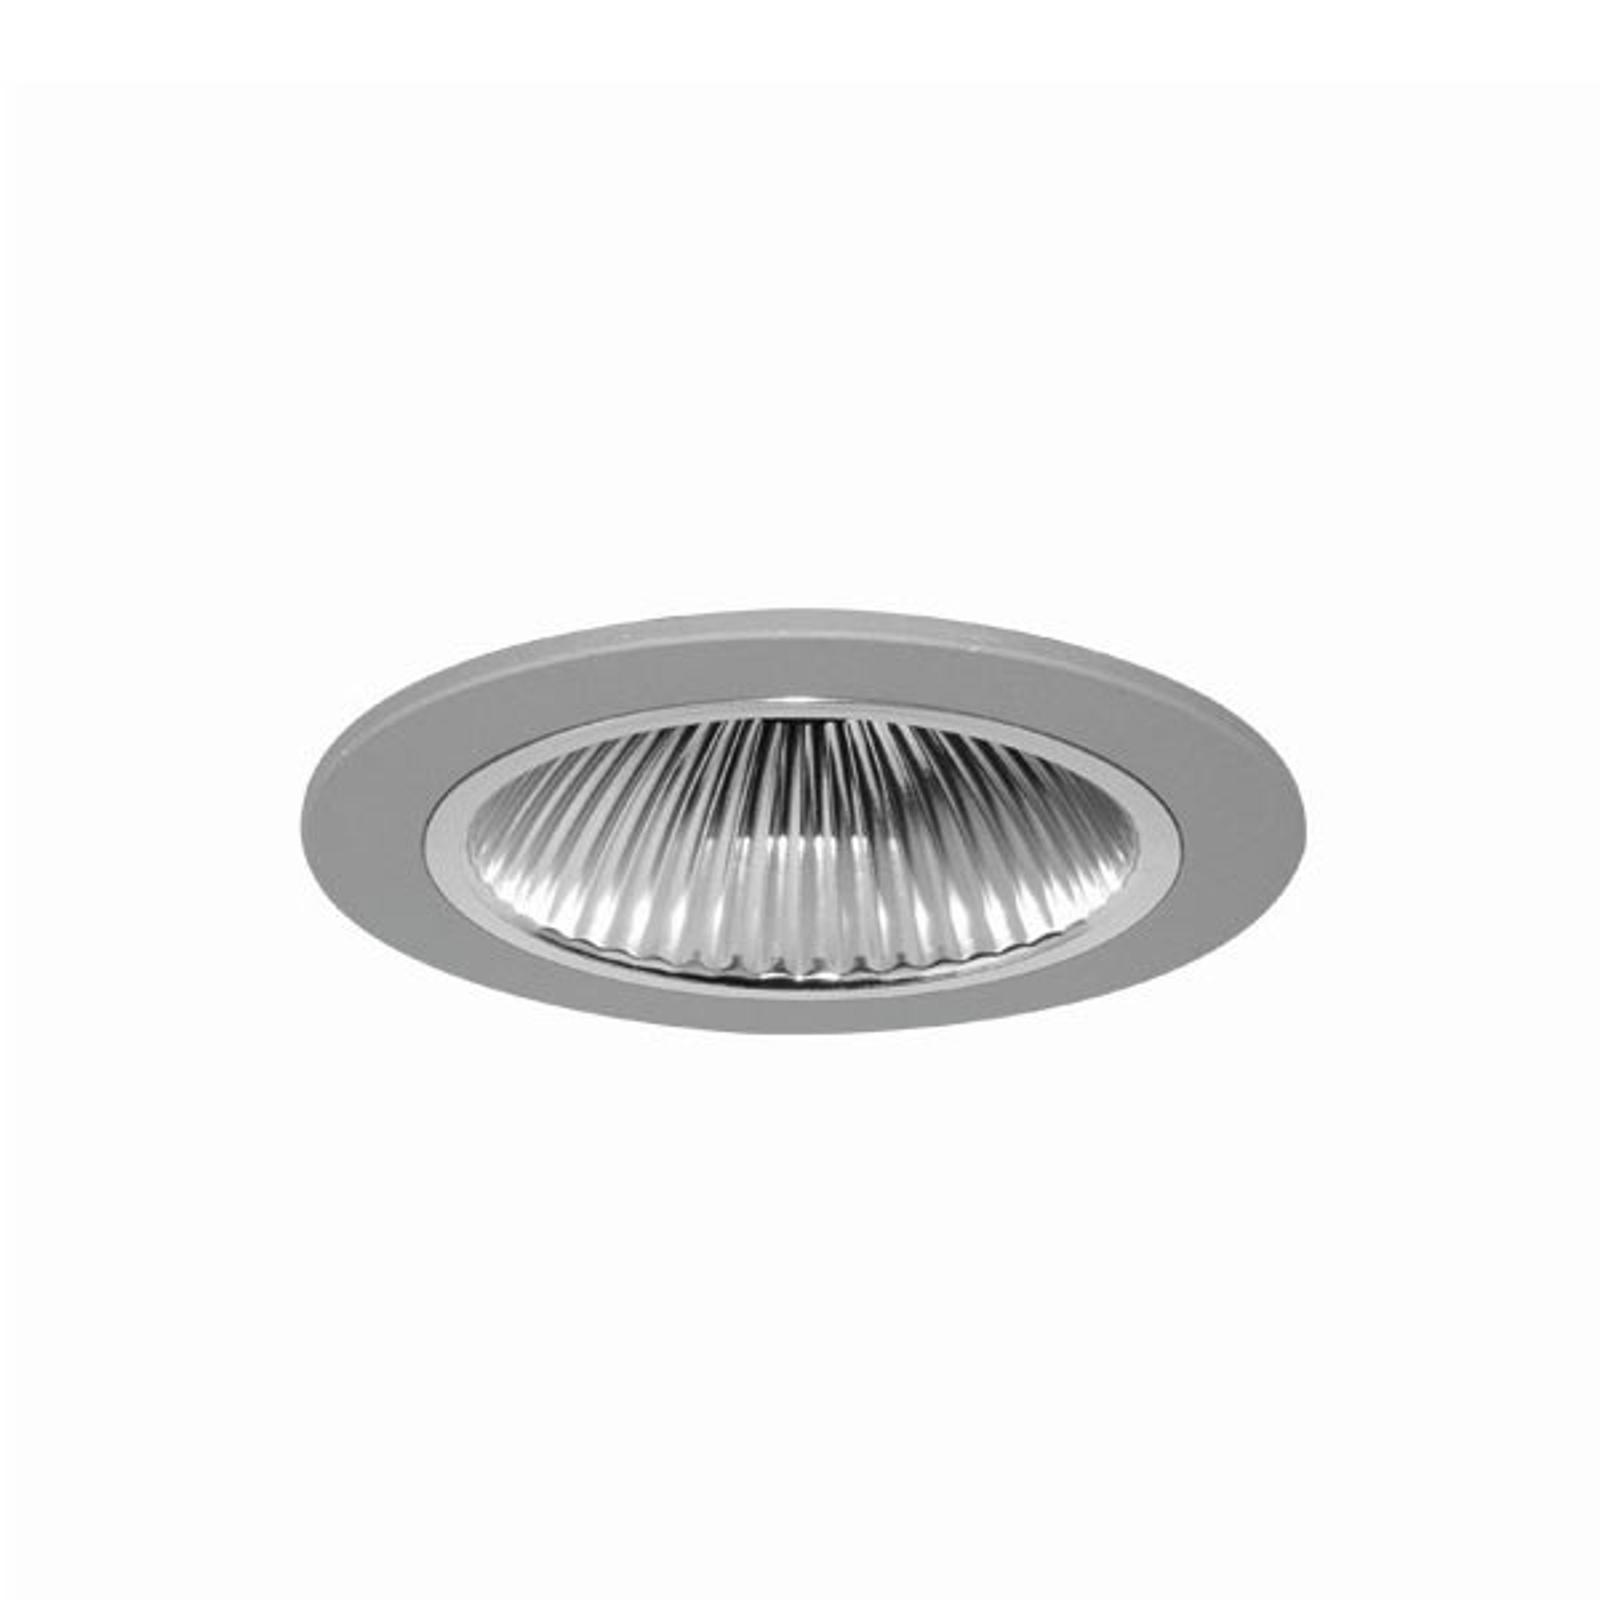 Spot encastrable LED CSA 40 Flat 35° 14 W 1410 lm